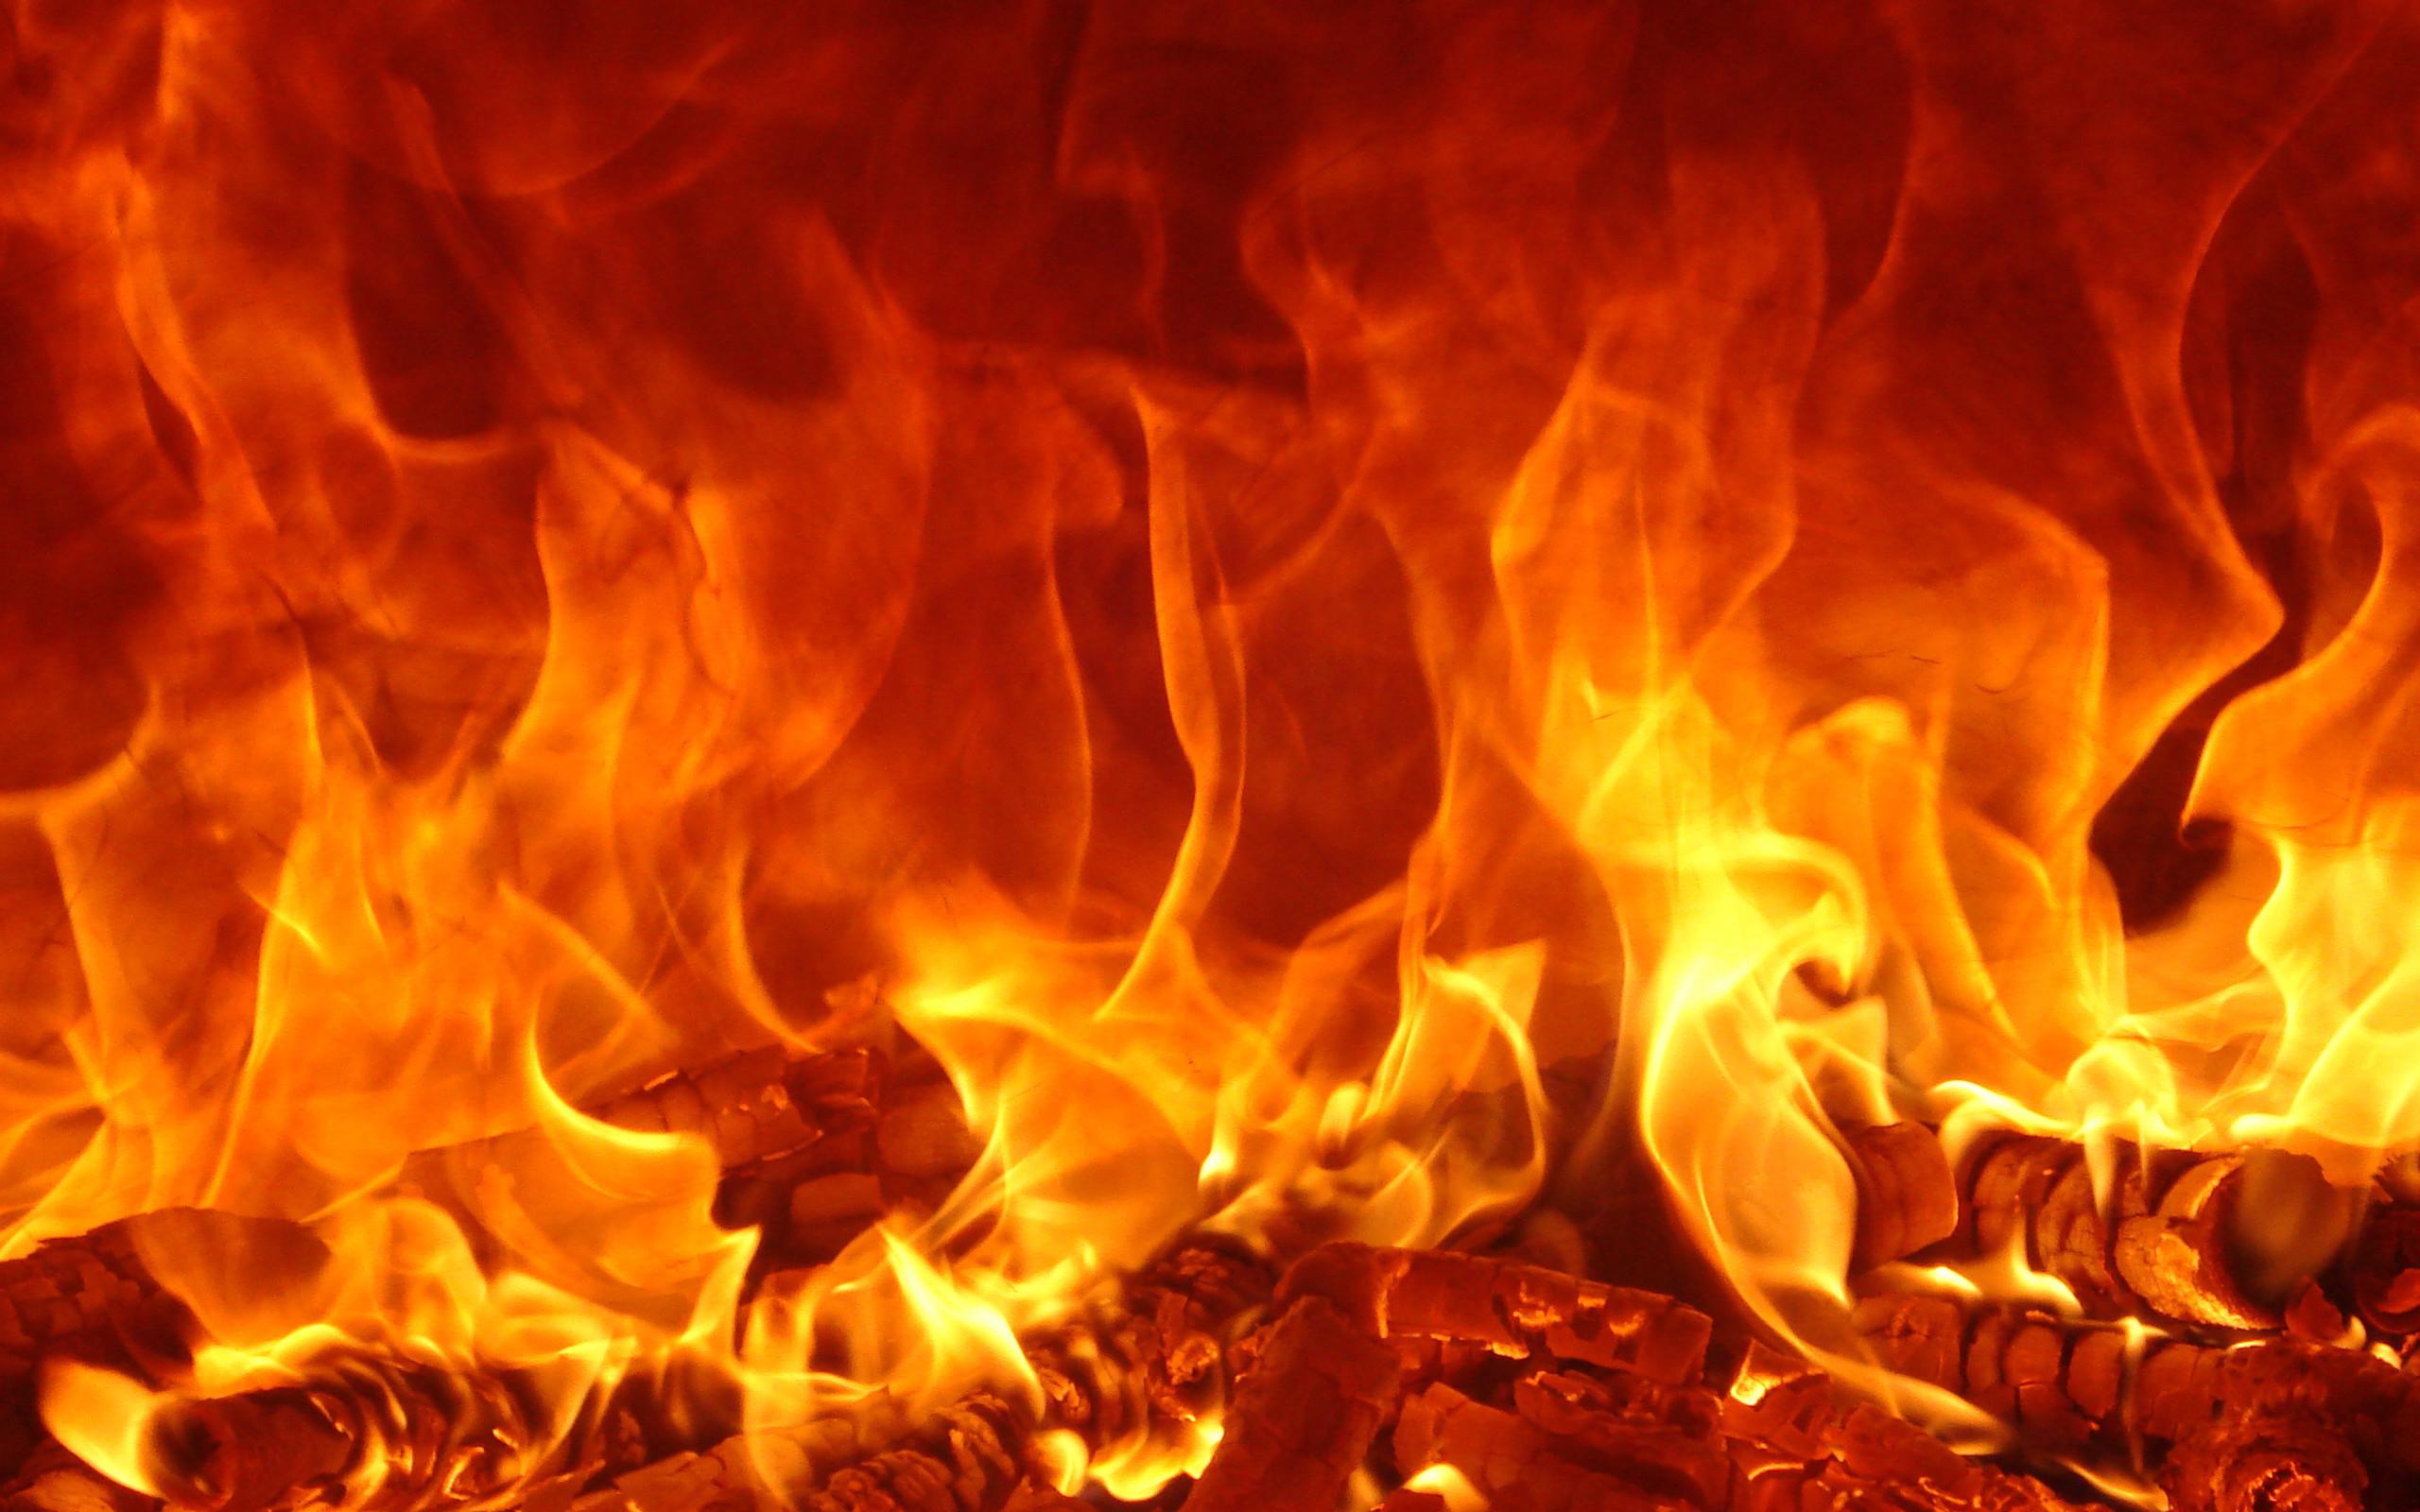 Flames Hd